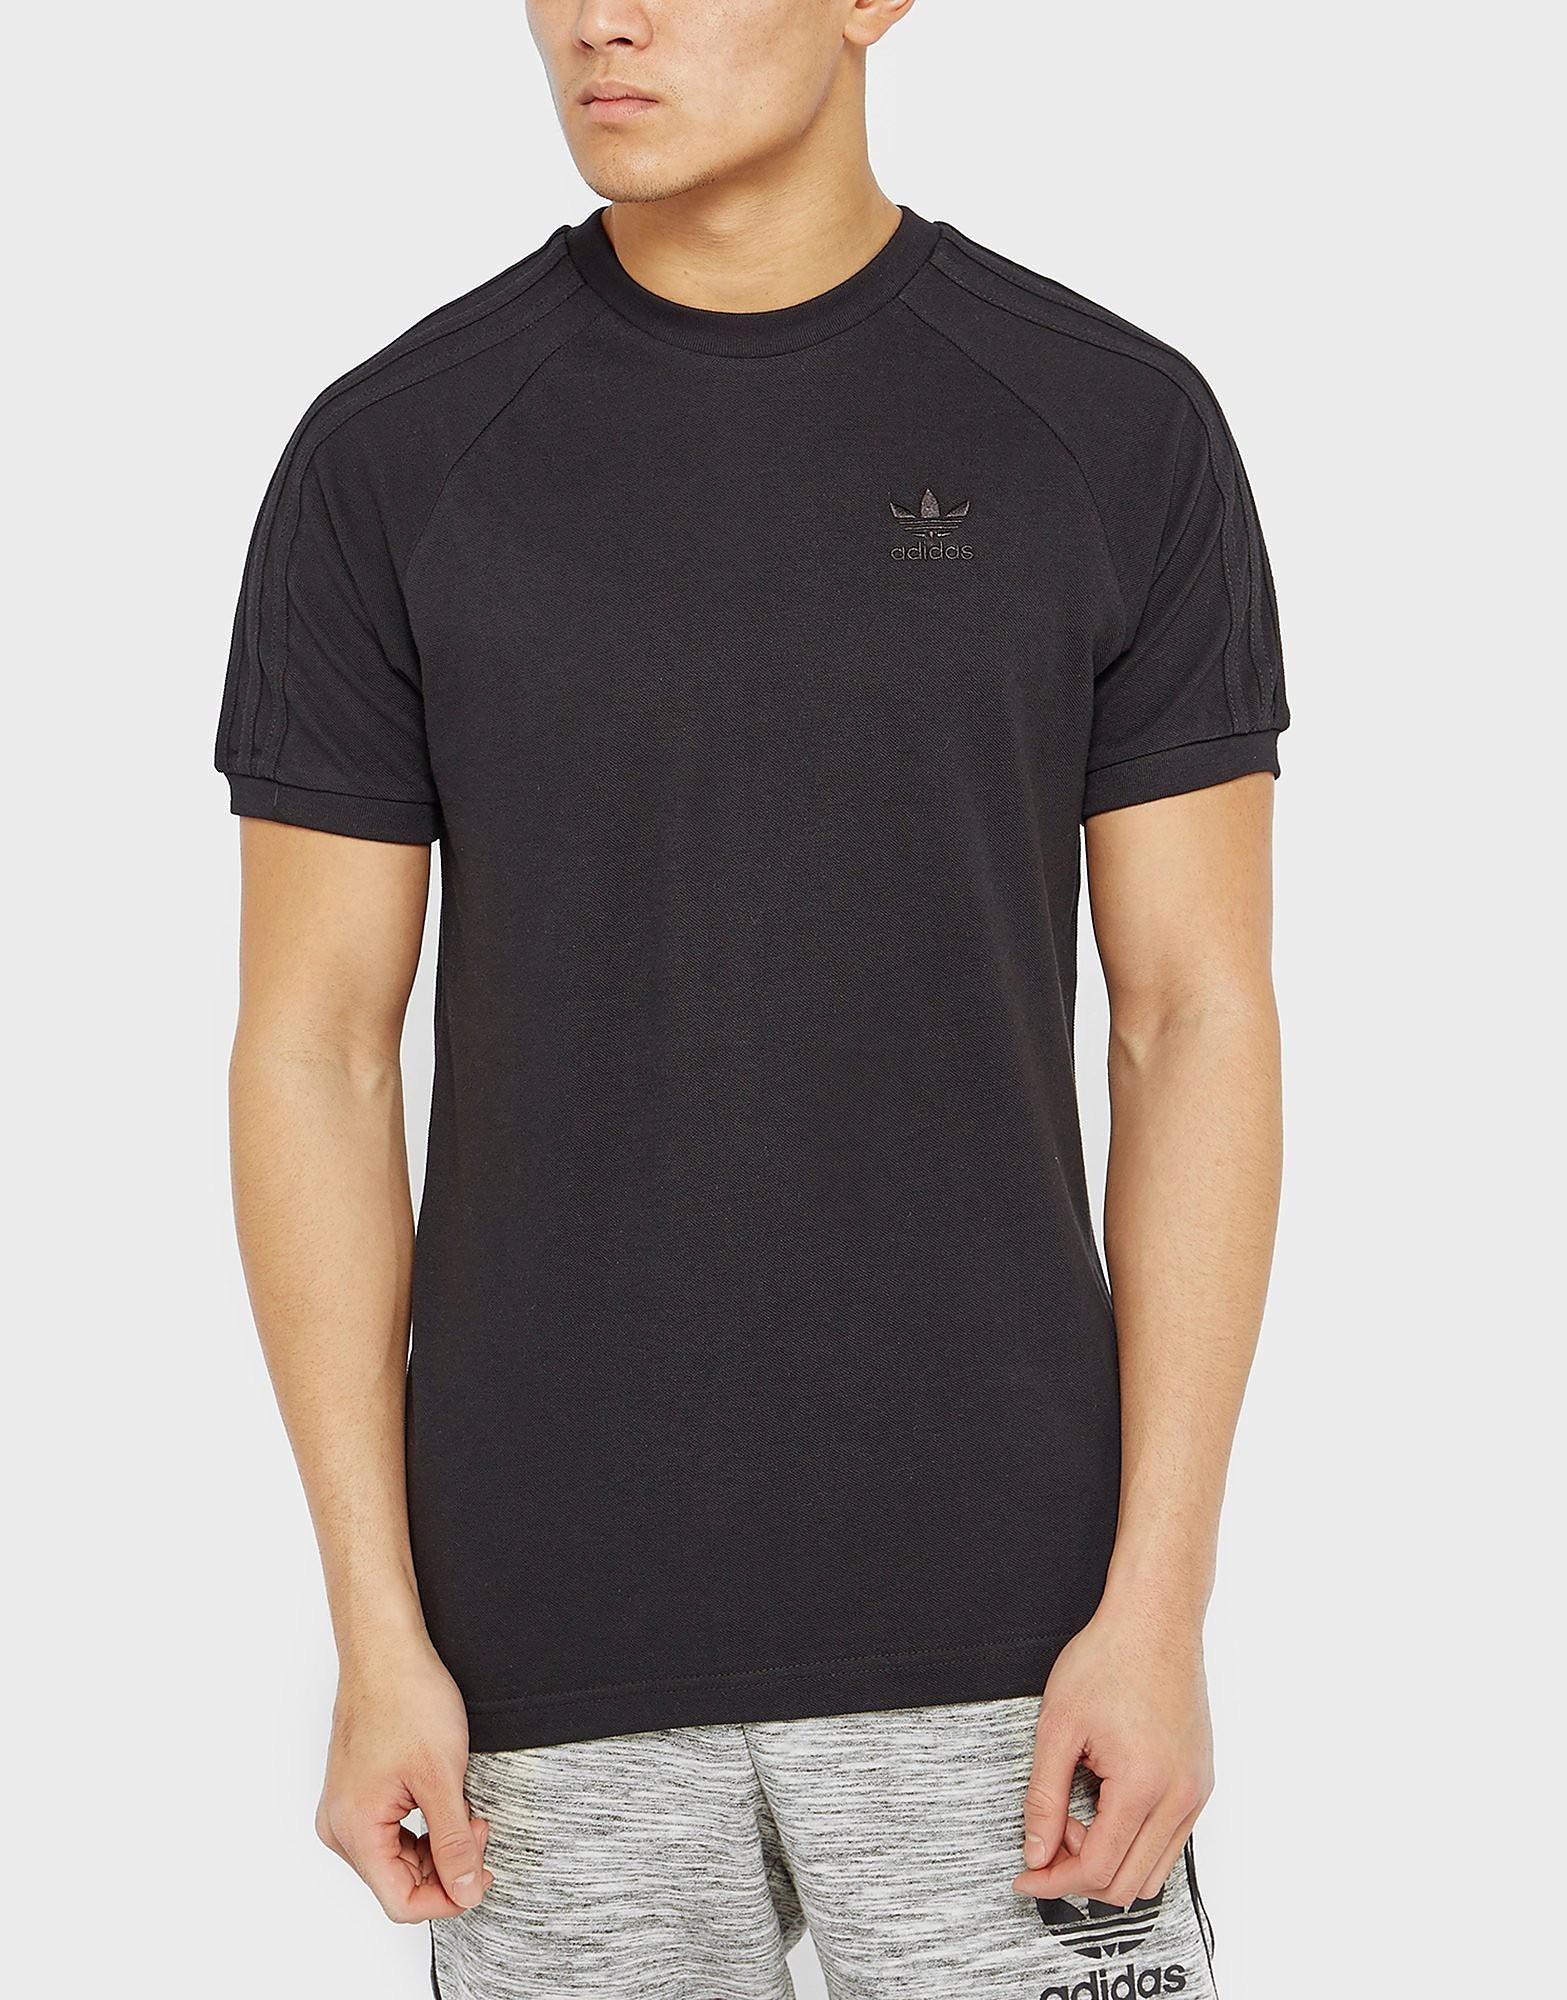 adidas Originals Crew Pique Short Sleeve T-Shirt